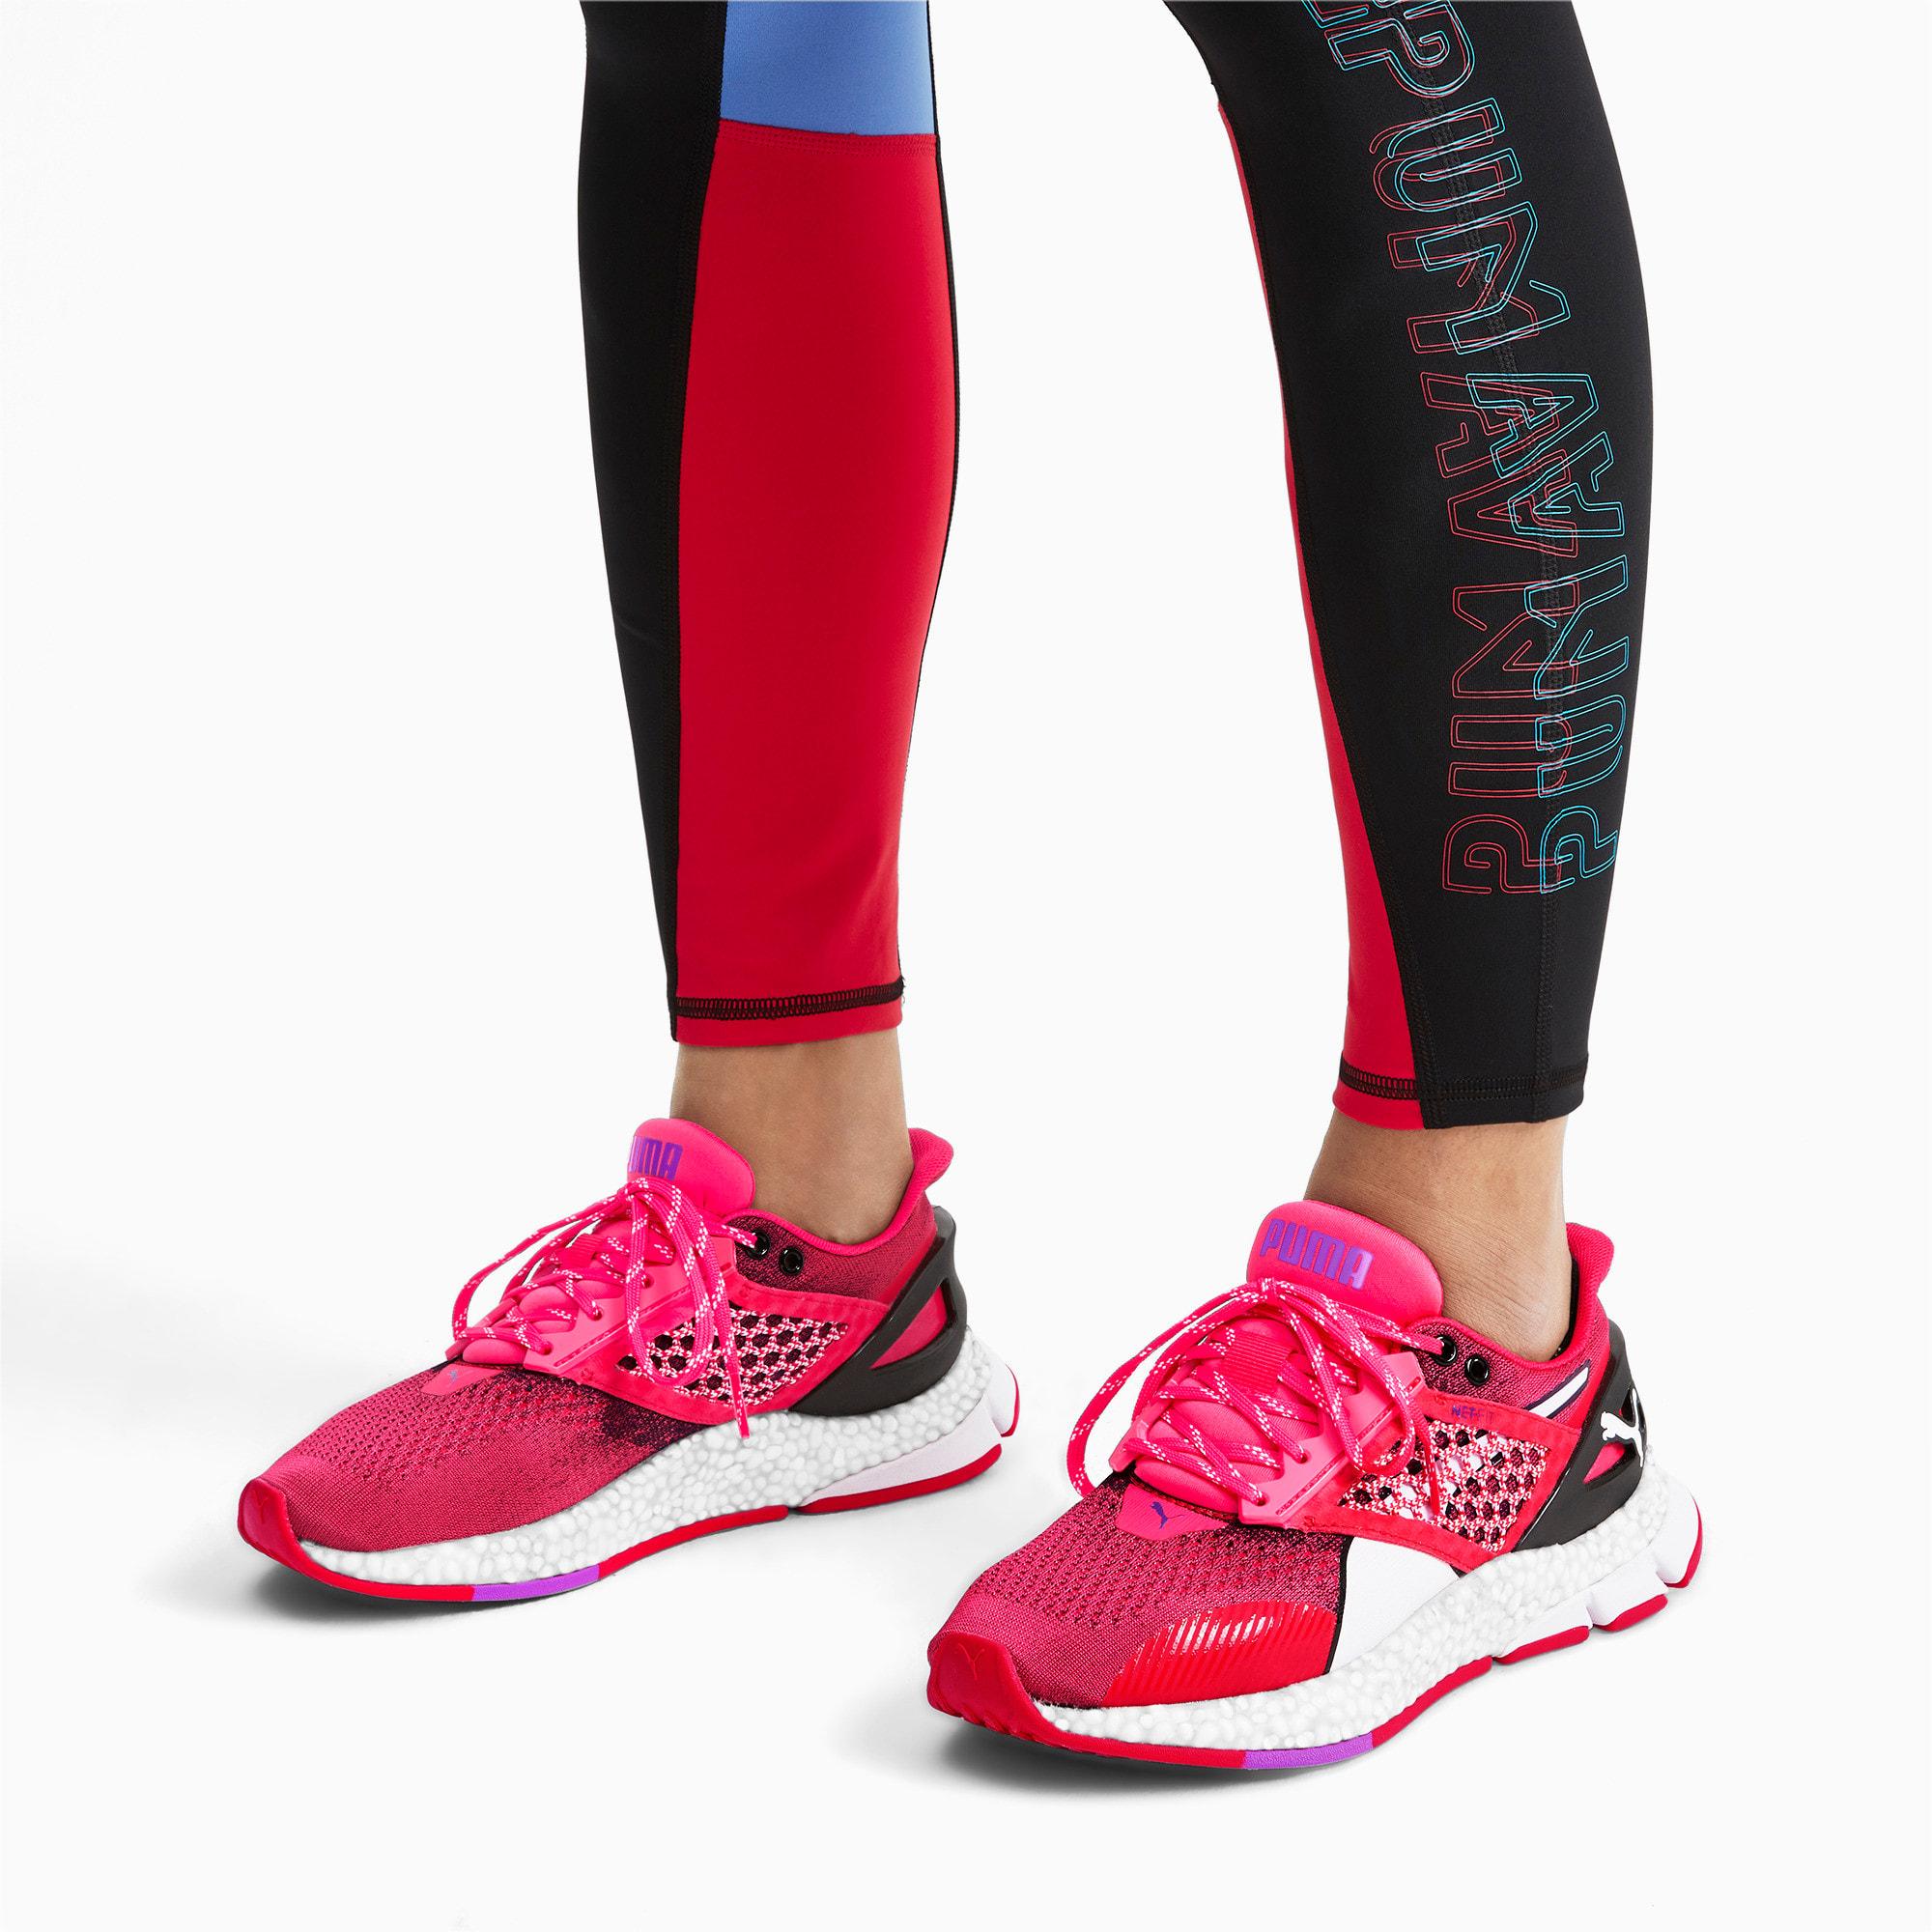 Thumbnail 2 of HYBRID Astro Women's Running Shoes, Nrgy Rose-Puma Black, medium